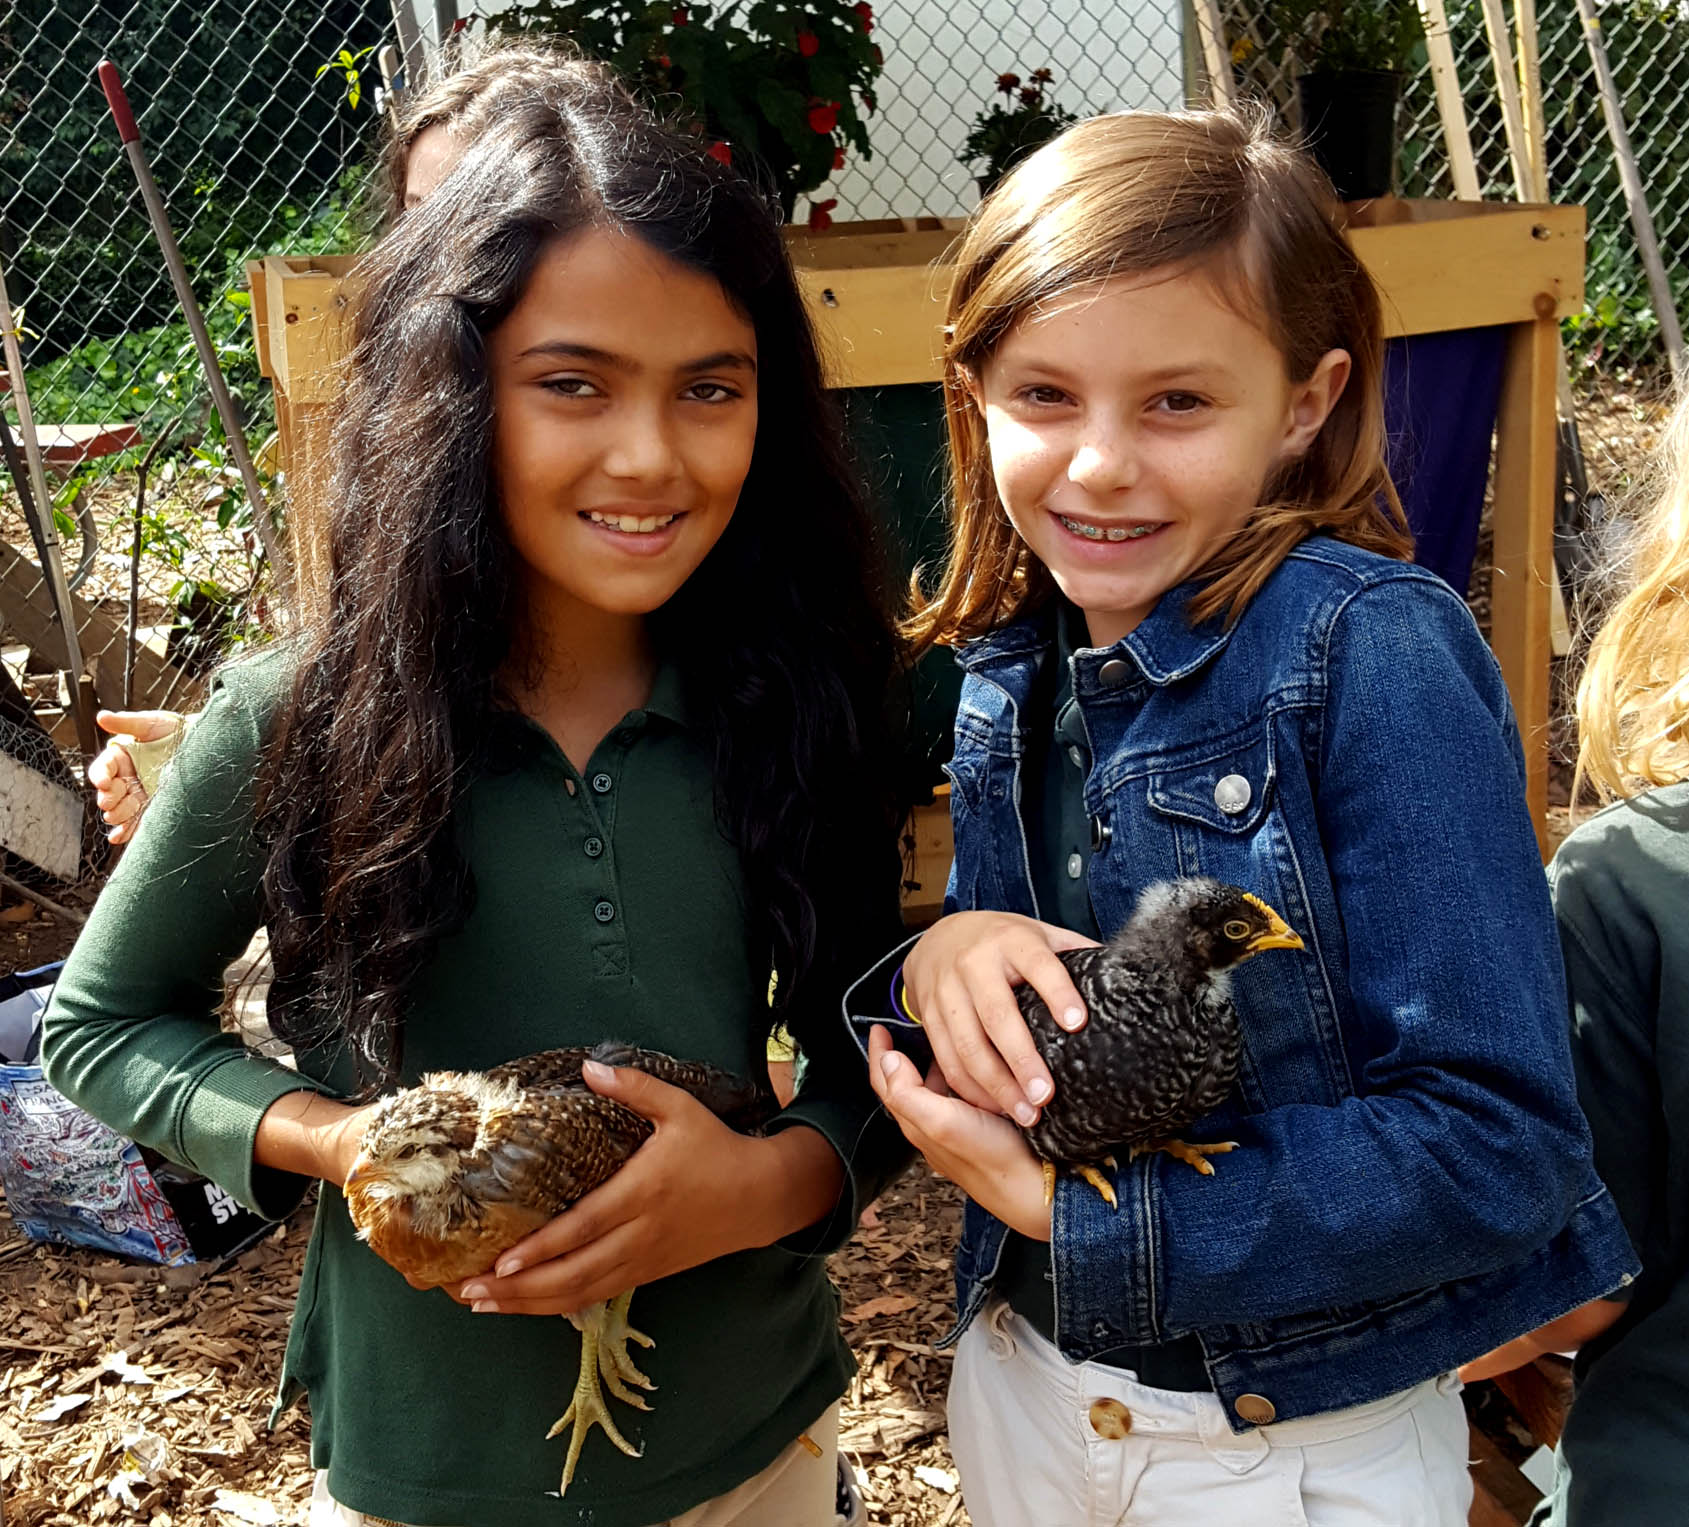 chickens_chicks_week4_amani_tessa_ firstborn_starlight_edited